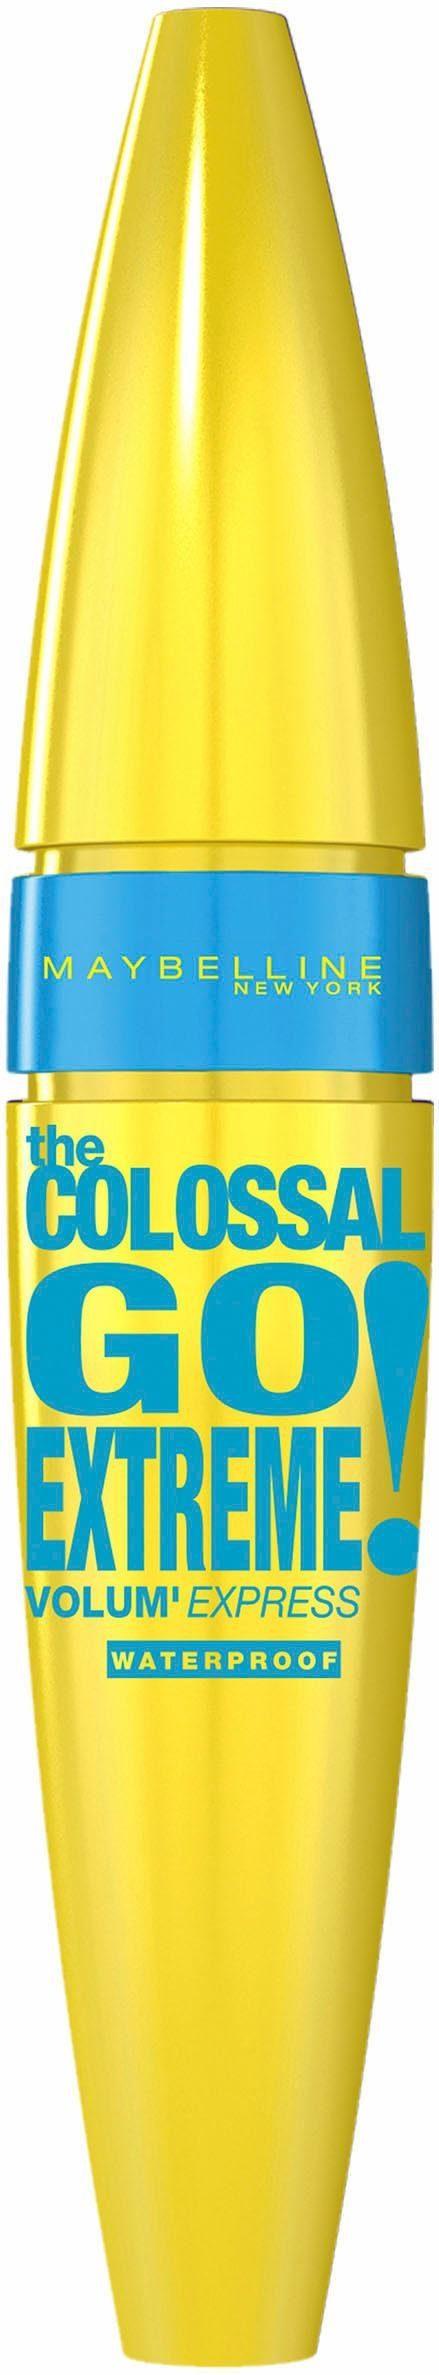 MAYBELLINE NEW YORK Mascara »Mascara VEX Colossal Go Extreme Waterproof«, Doppel-Pump-Wimpernbürste